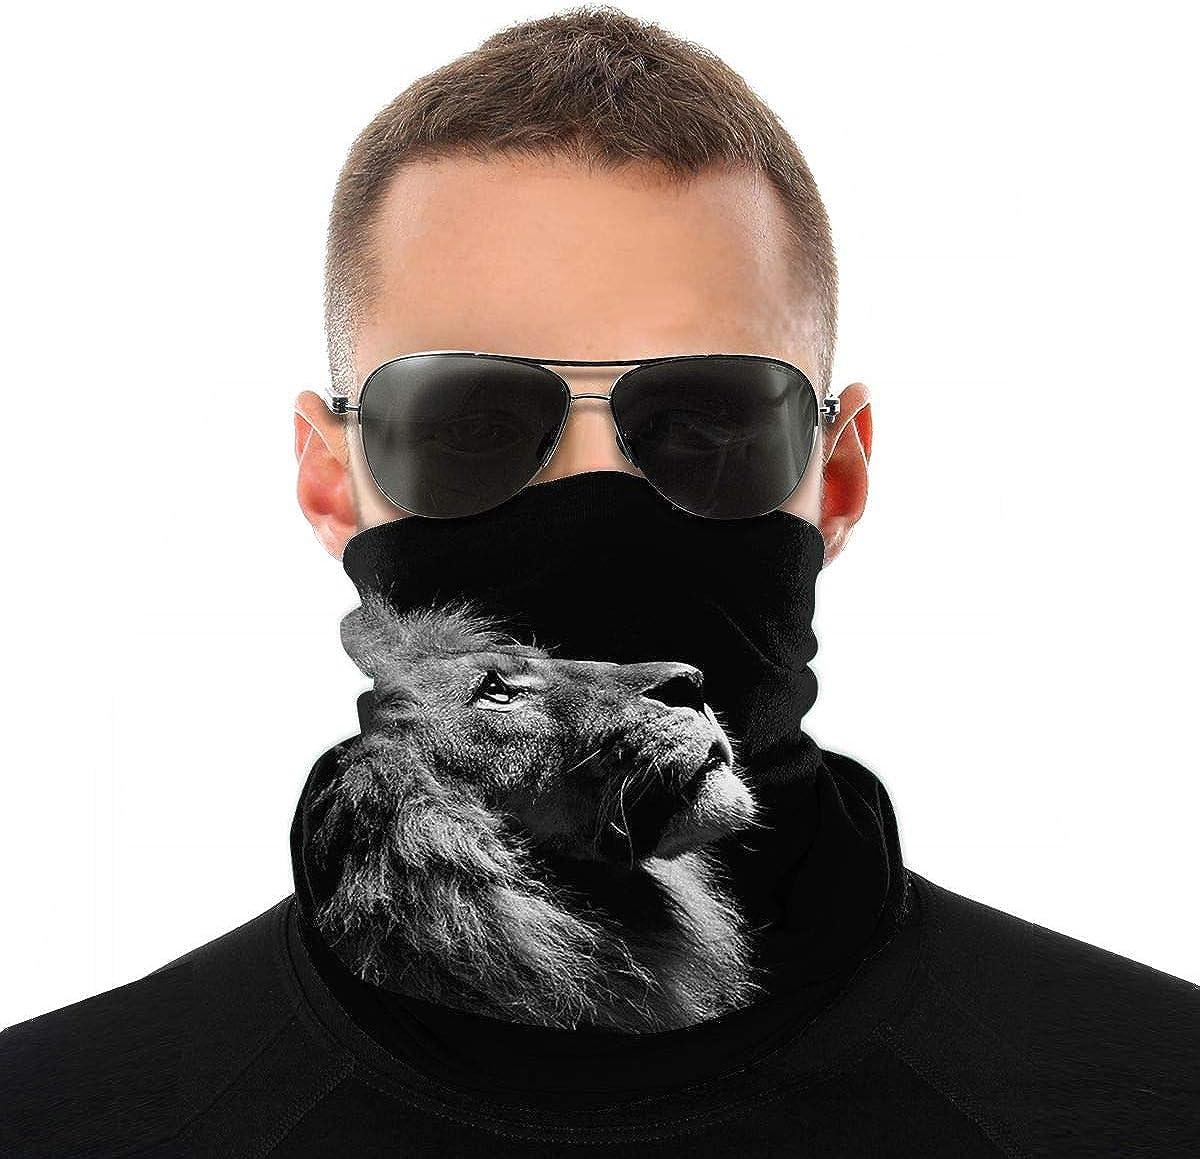 Kiuloam Bandanas Face Mask, Lion King Neck Gaiter Mask Headband for Men Women Face Scarf Dust, Outdoors, Sports